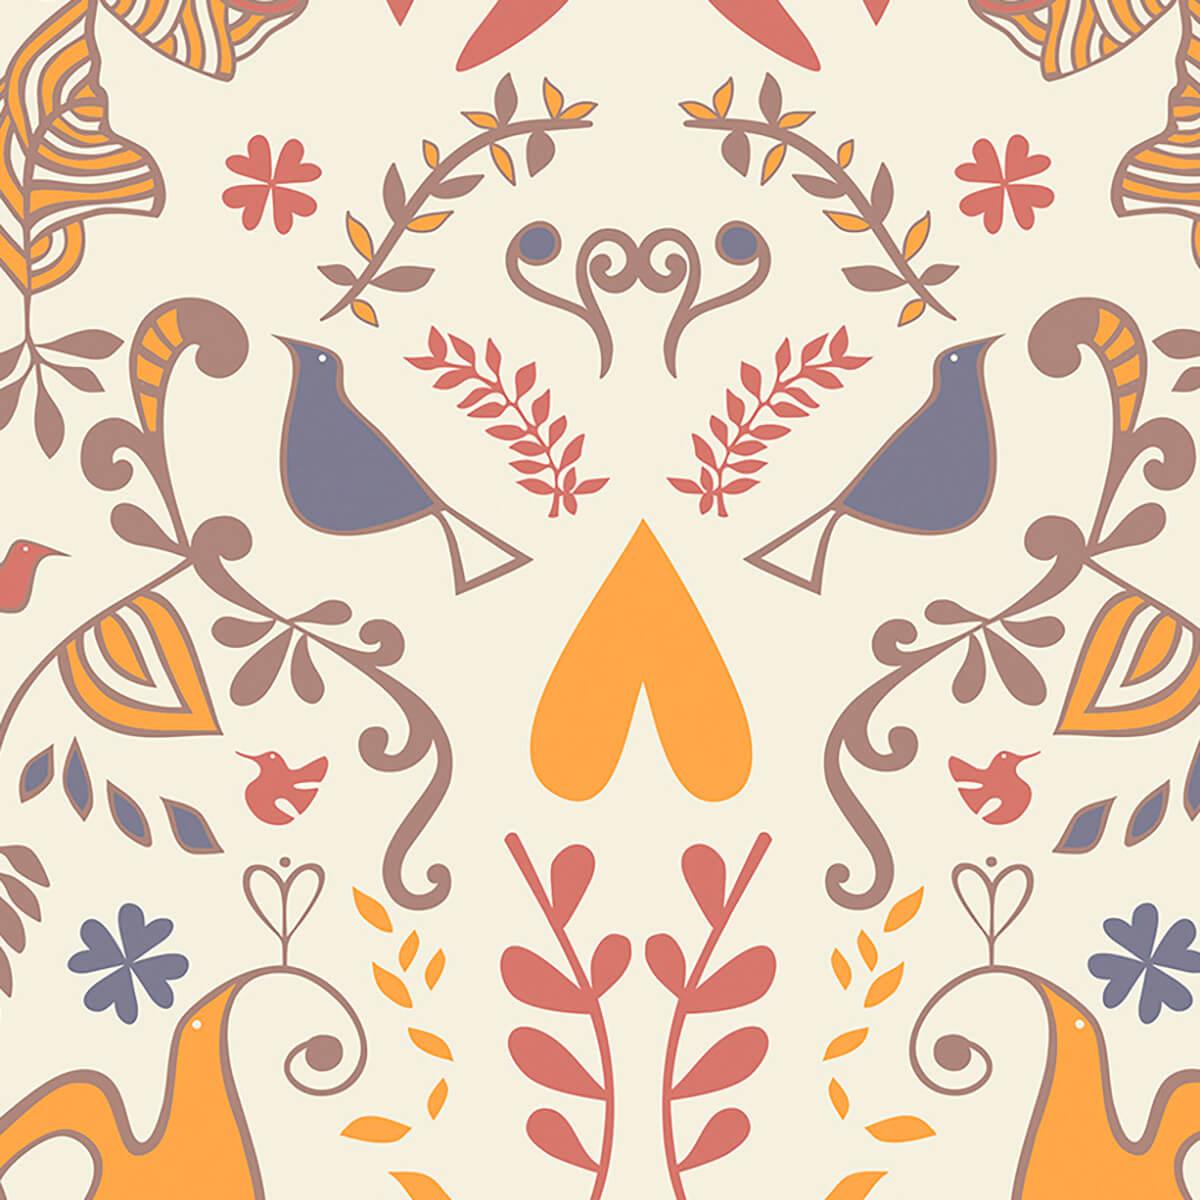 Papel de parede barroco | Joana Lira